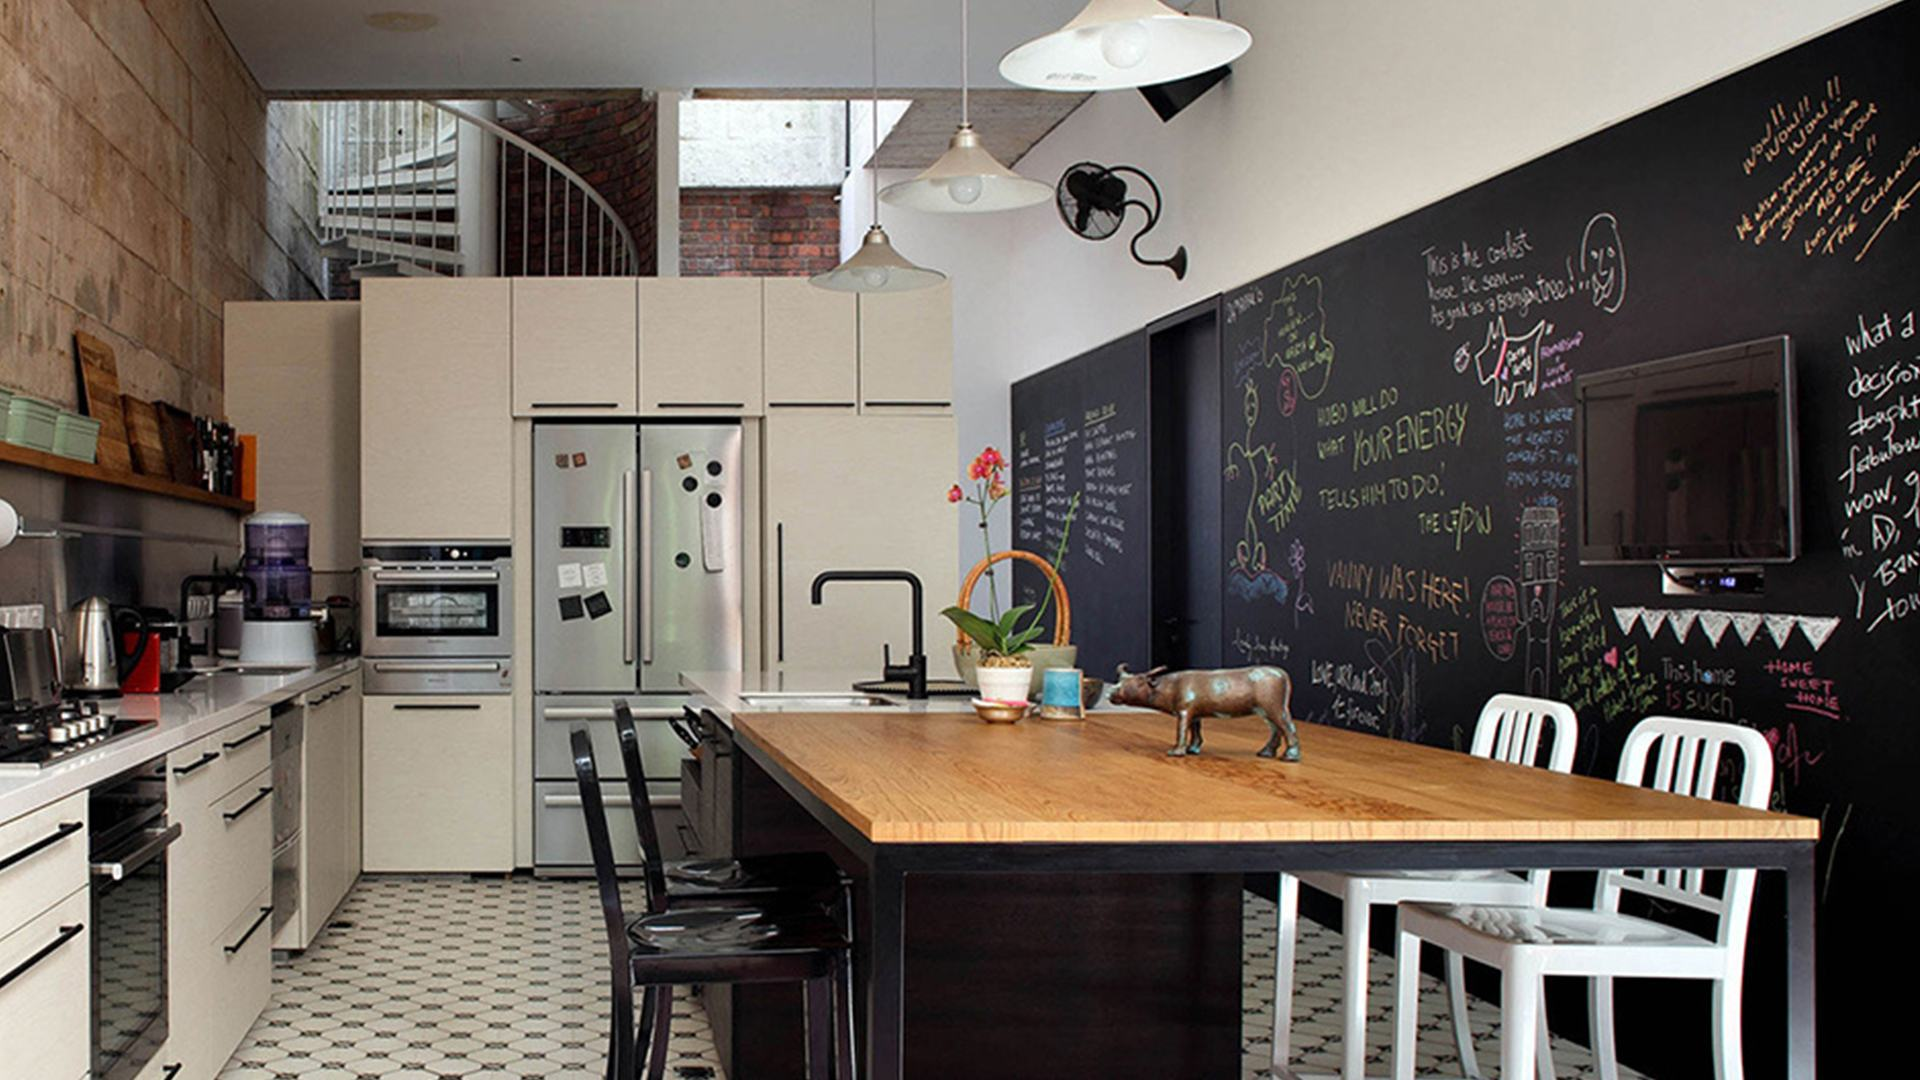 Pittura lavagna in cucina lube store milano le cucine - Pittura per cucine ...